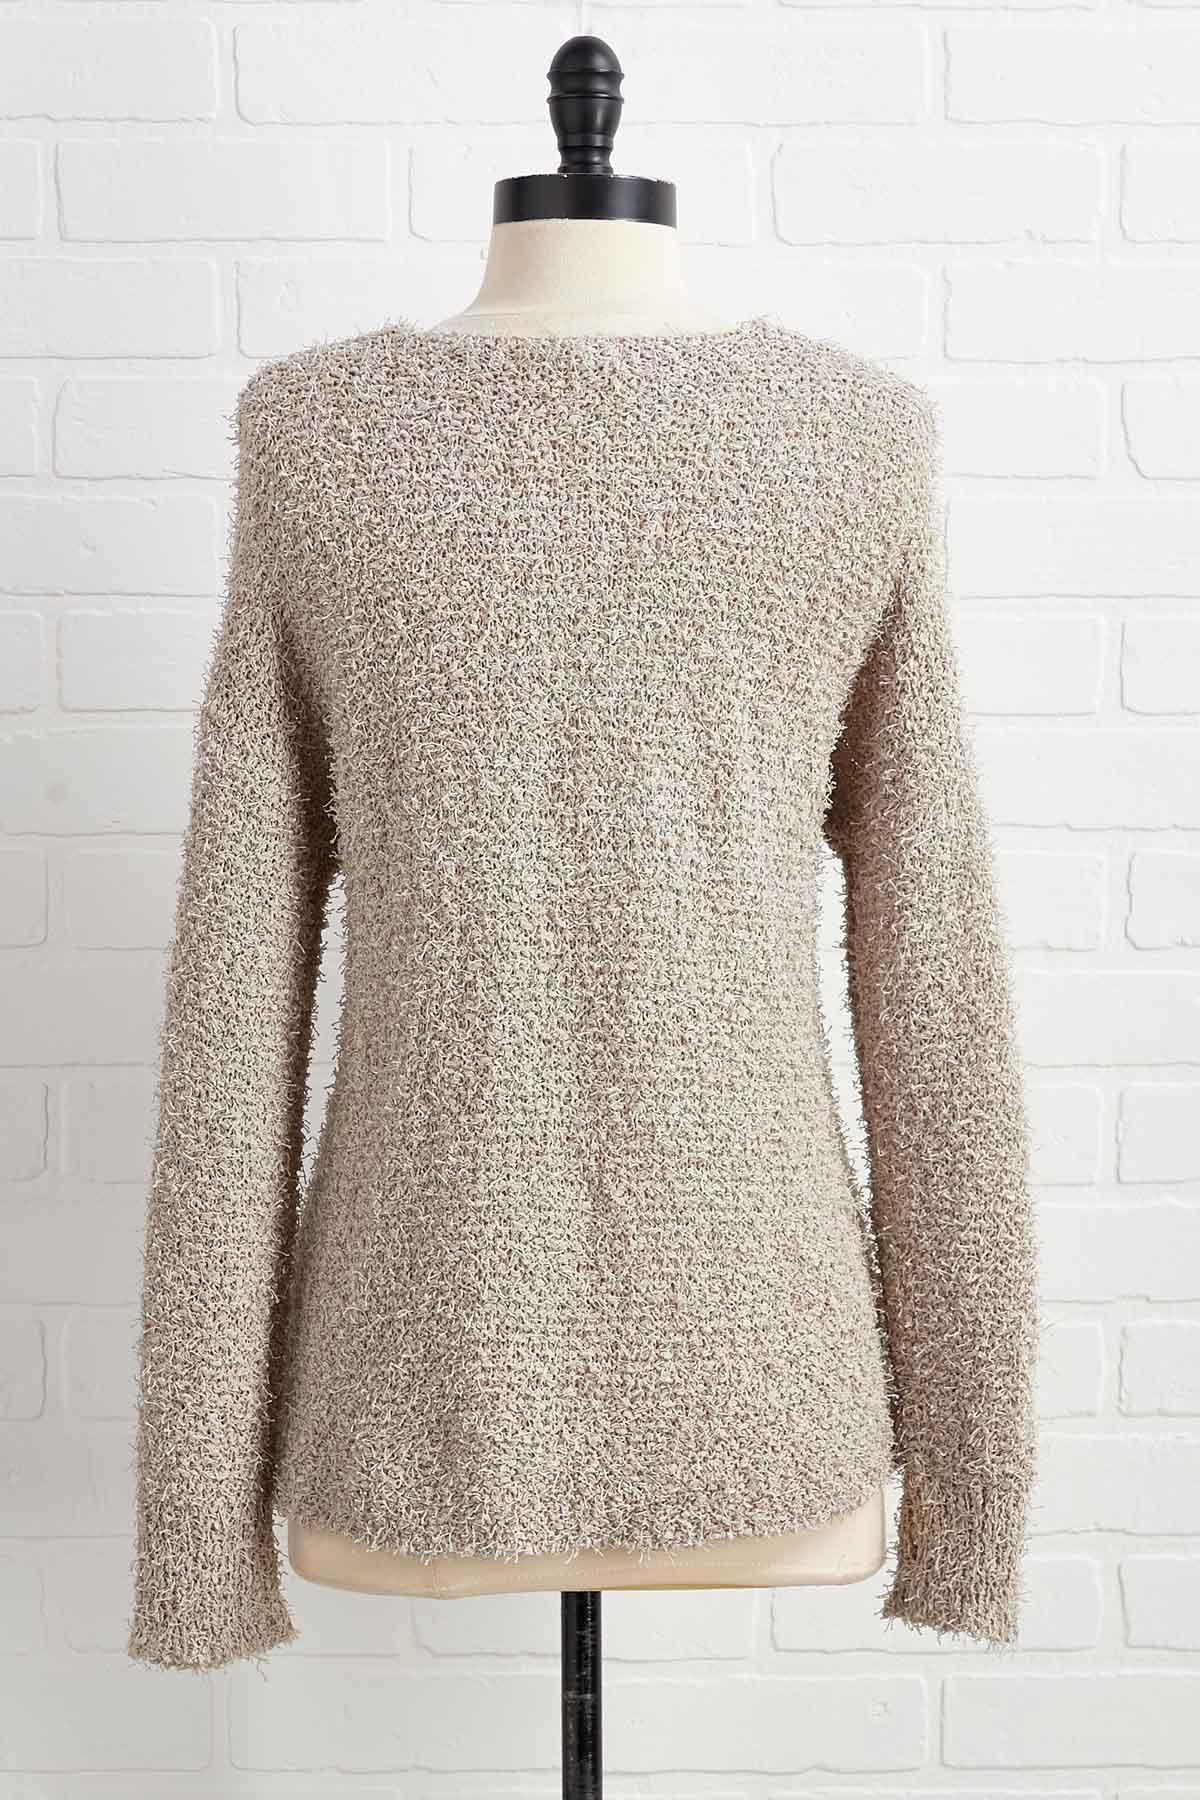 Feeling Neutral About It Sweater